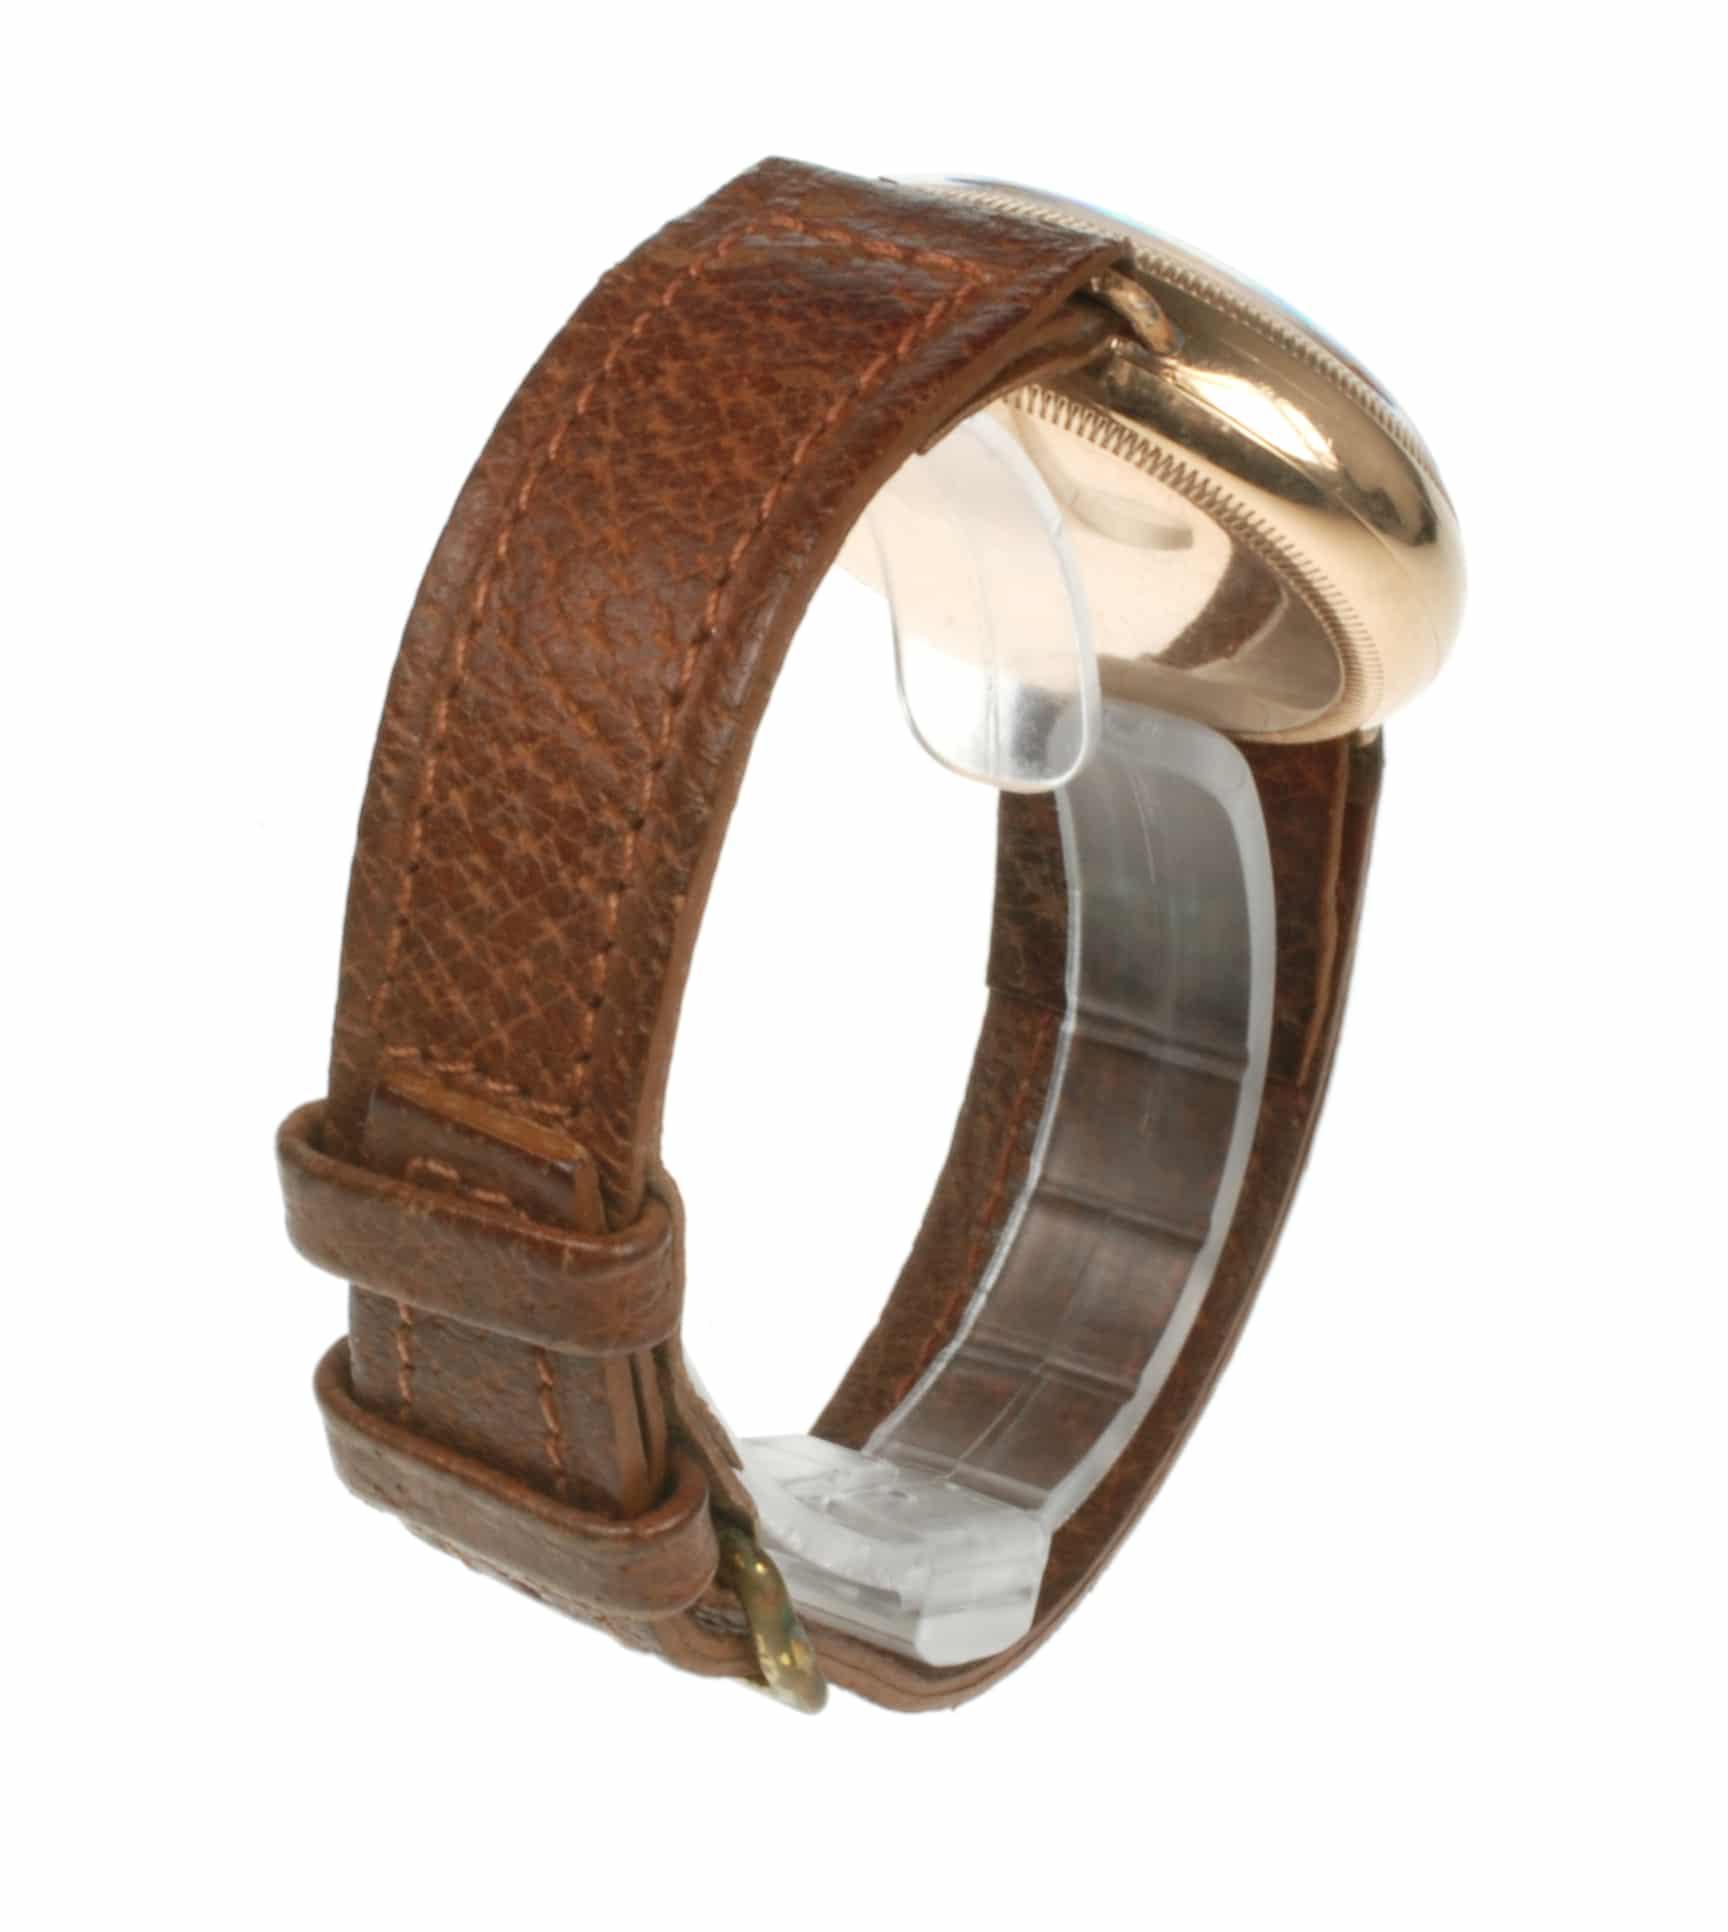 Vintage Dennison Manual Watch